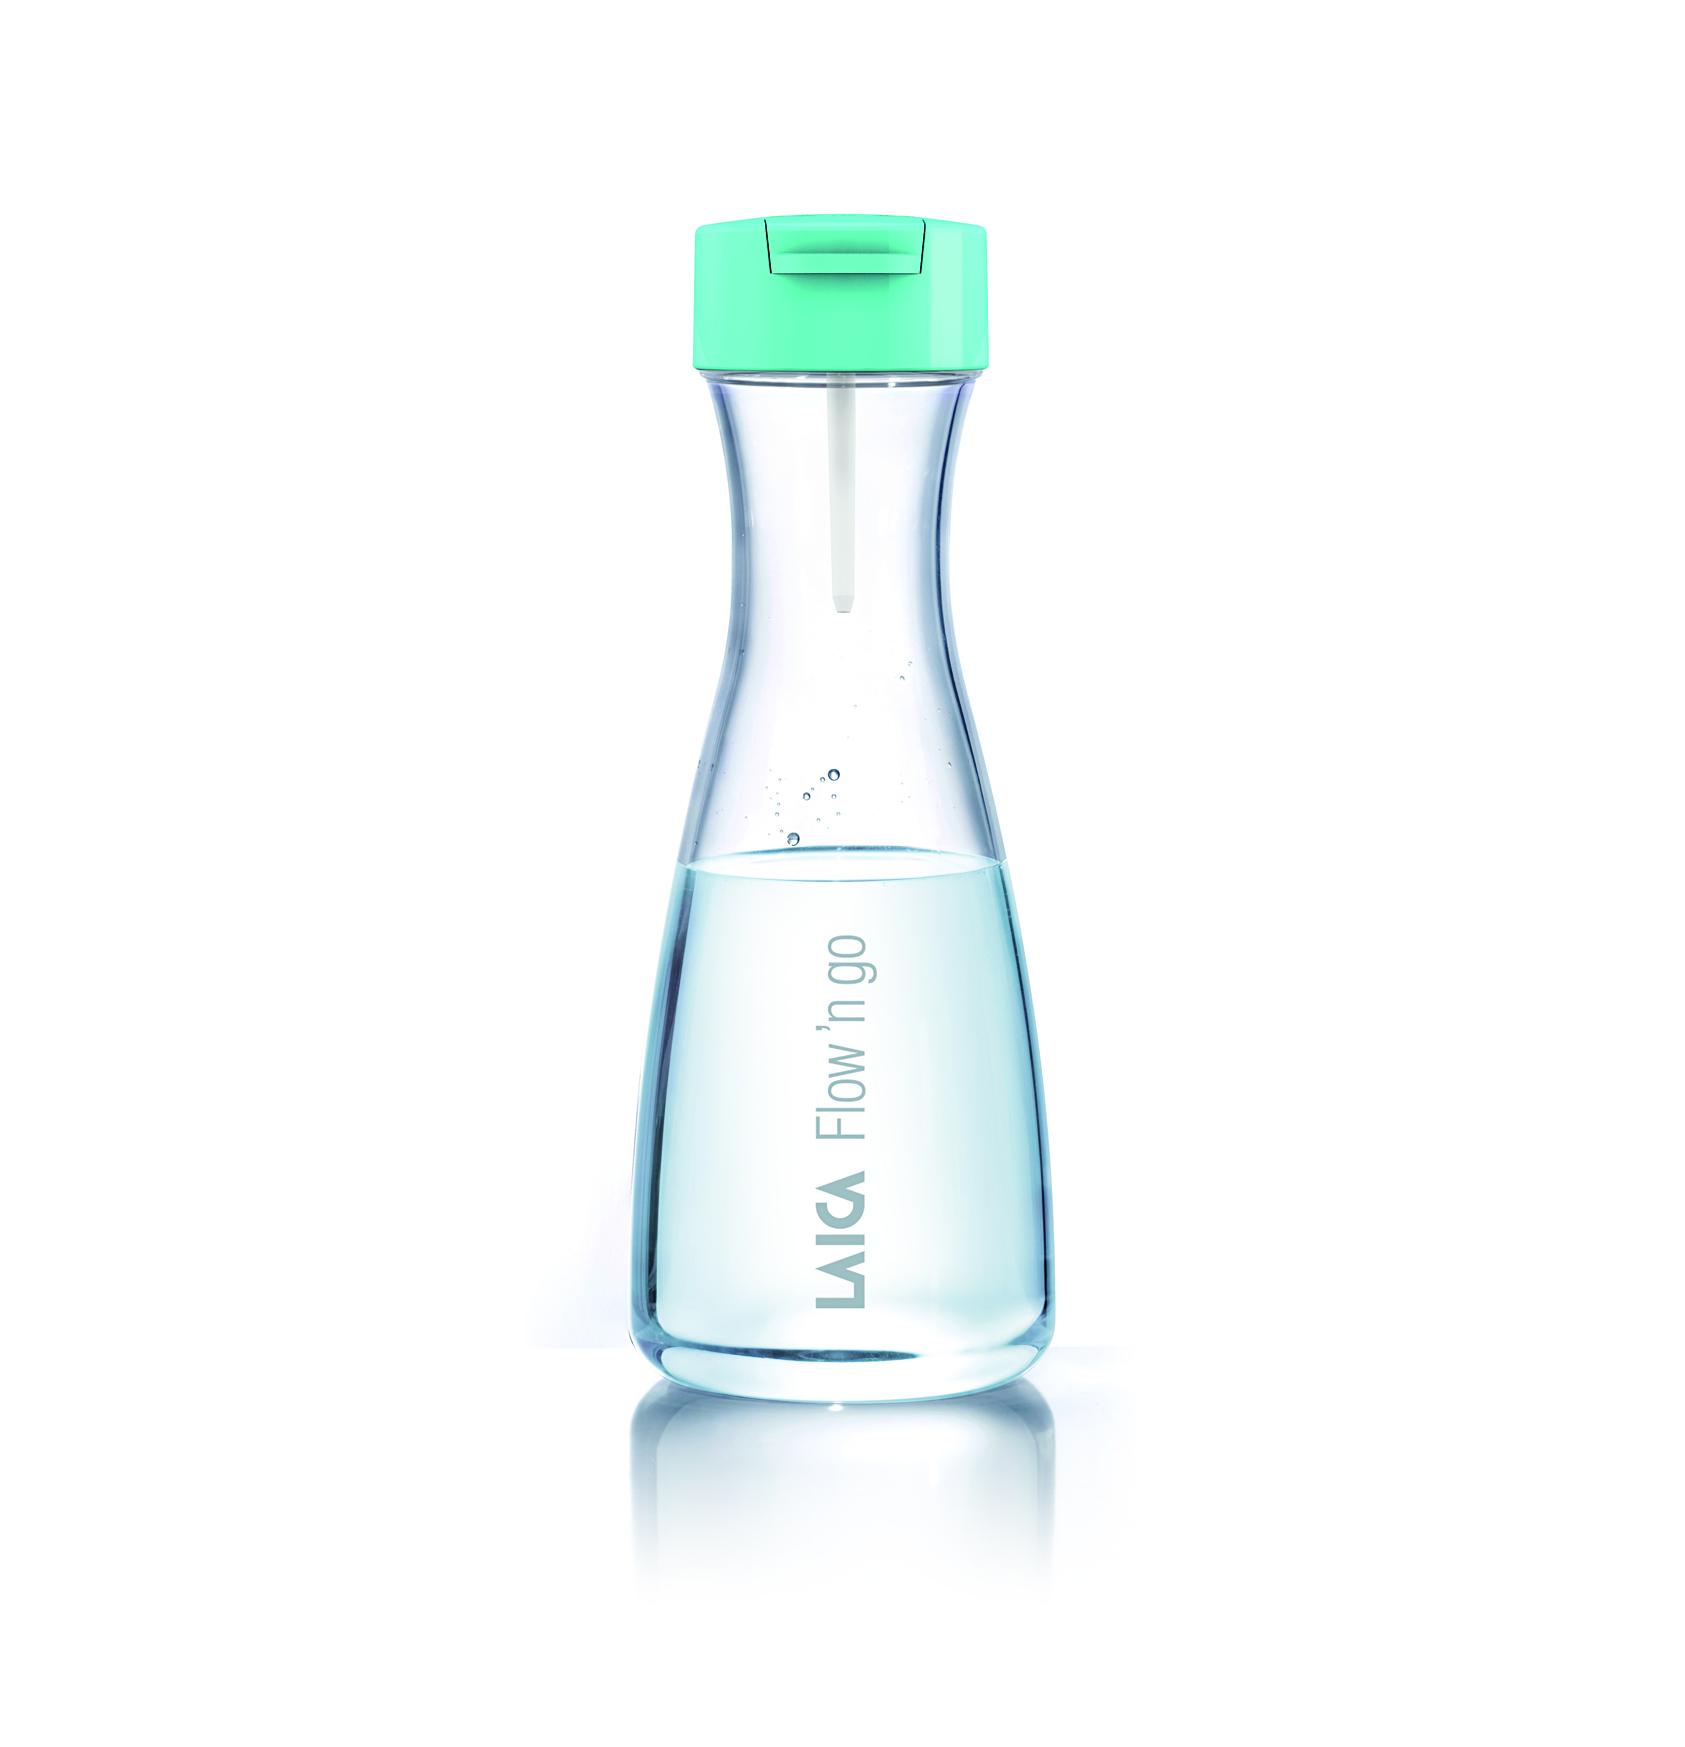 NOU: Carafa filtranta de apa Laica Flow 'n Go, 1 litru laicashop.ro 2021